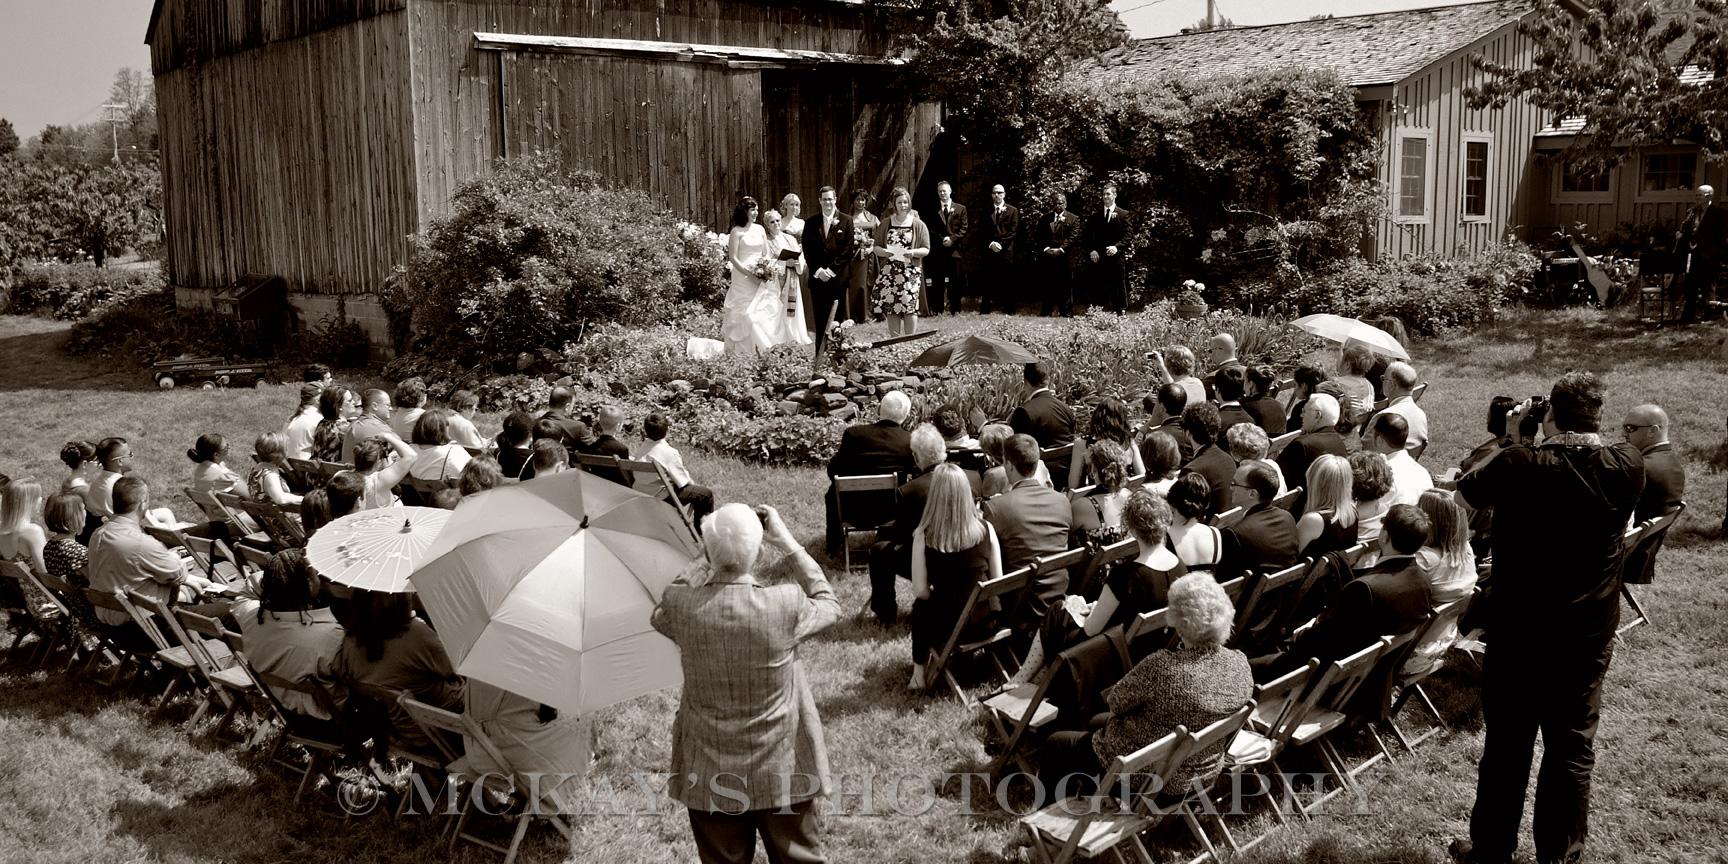 Hurd Orchards is a barn wedding venue near Rochester and Buffalo NY